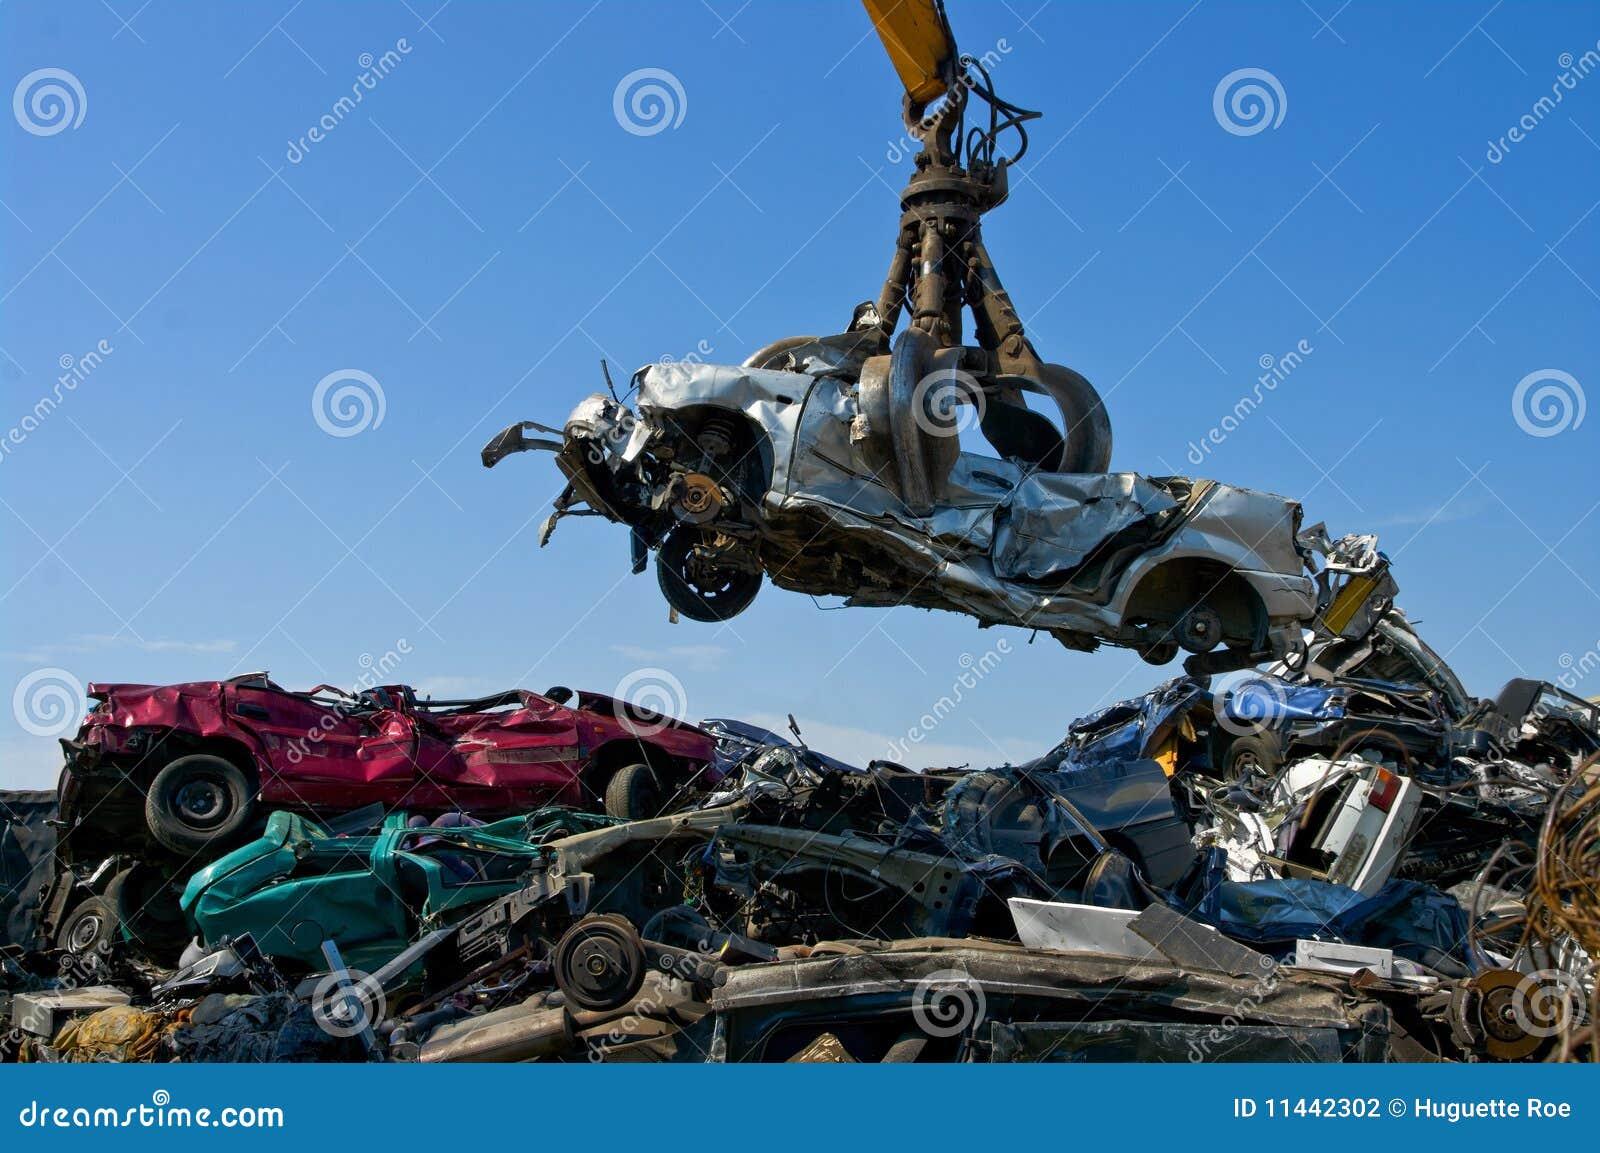 Junkyard For Used Car Parts